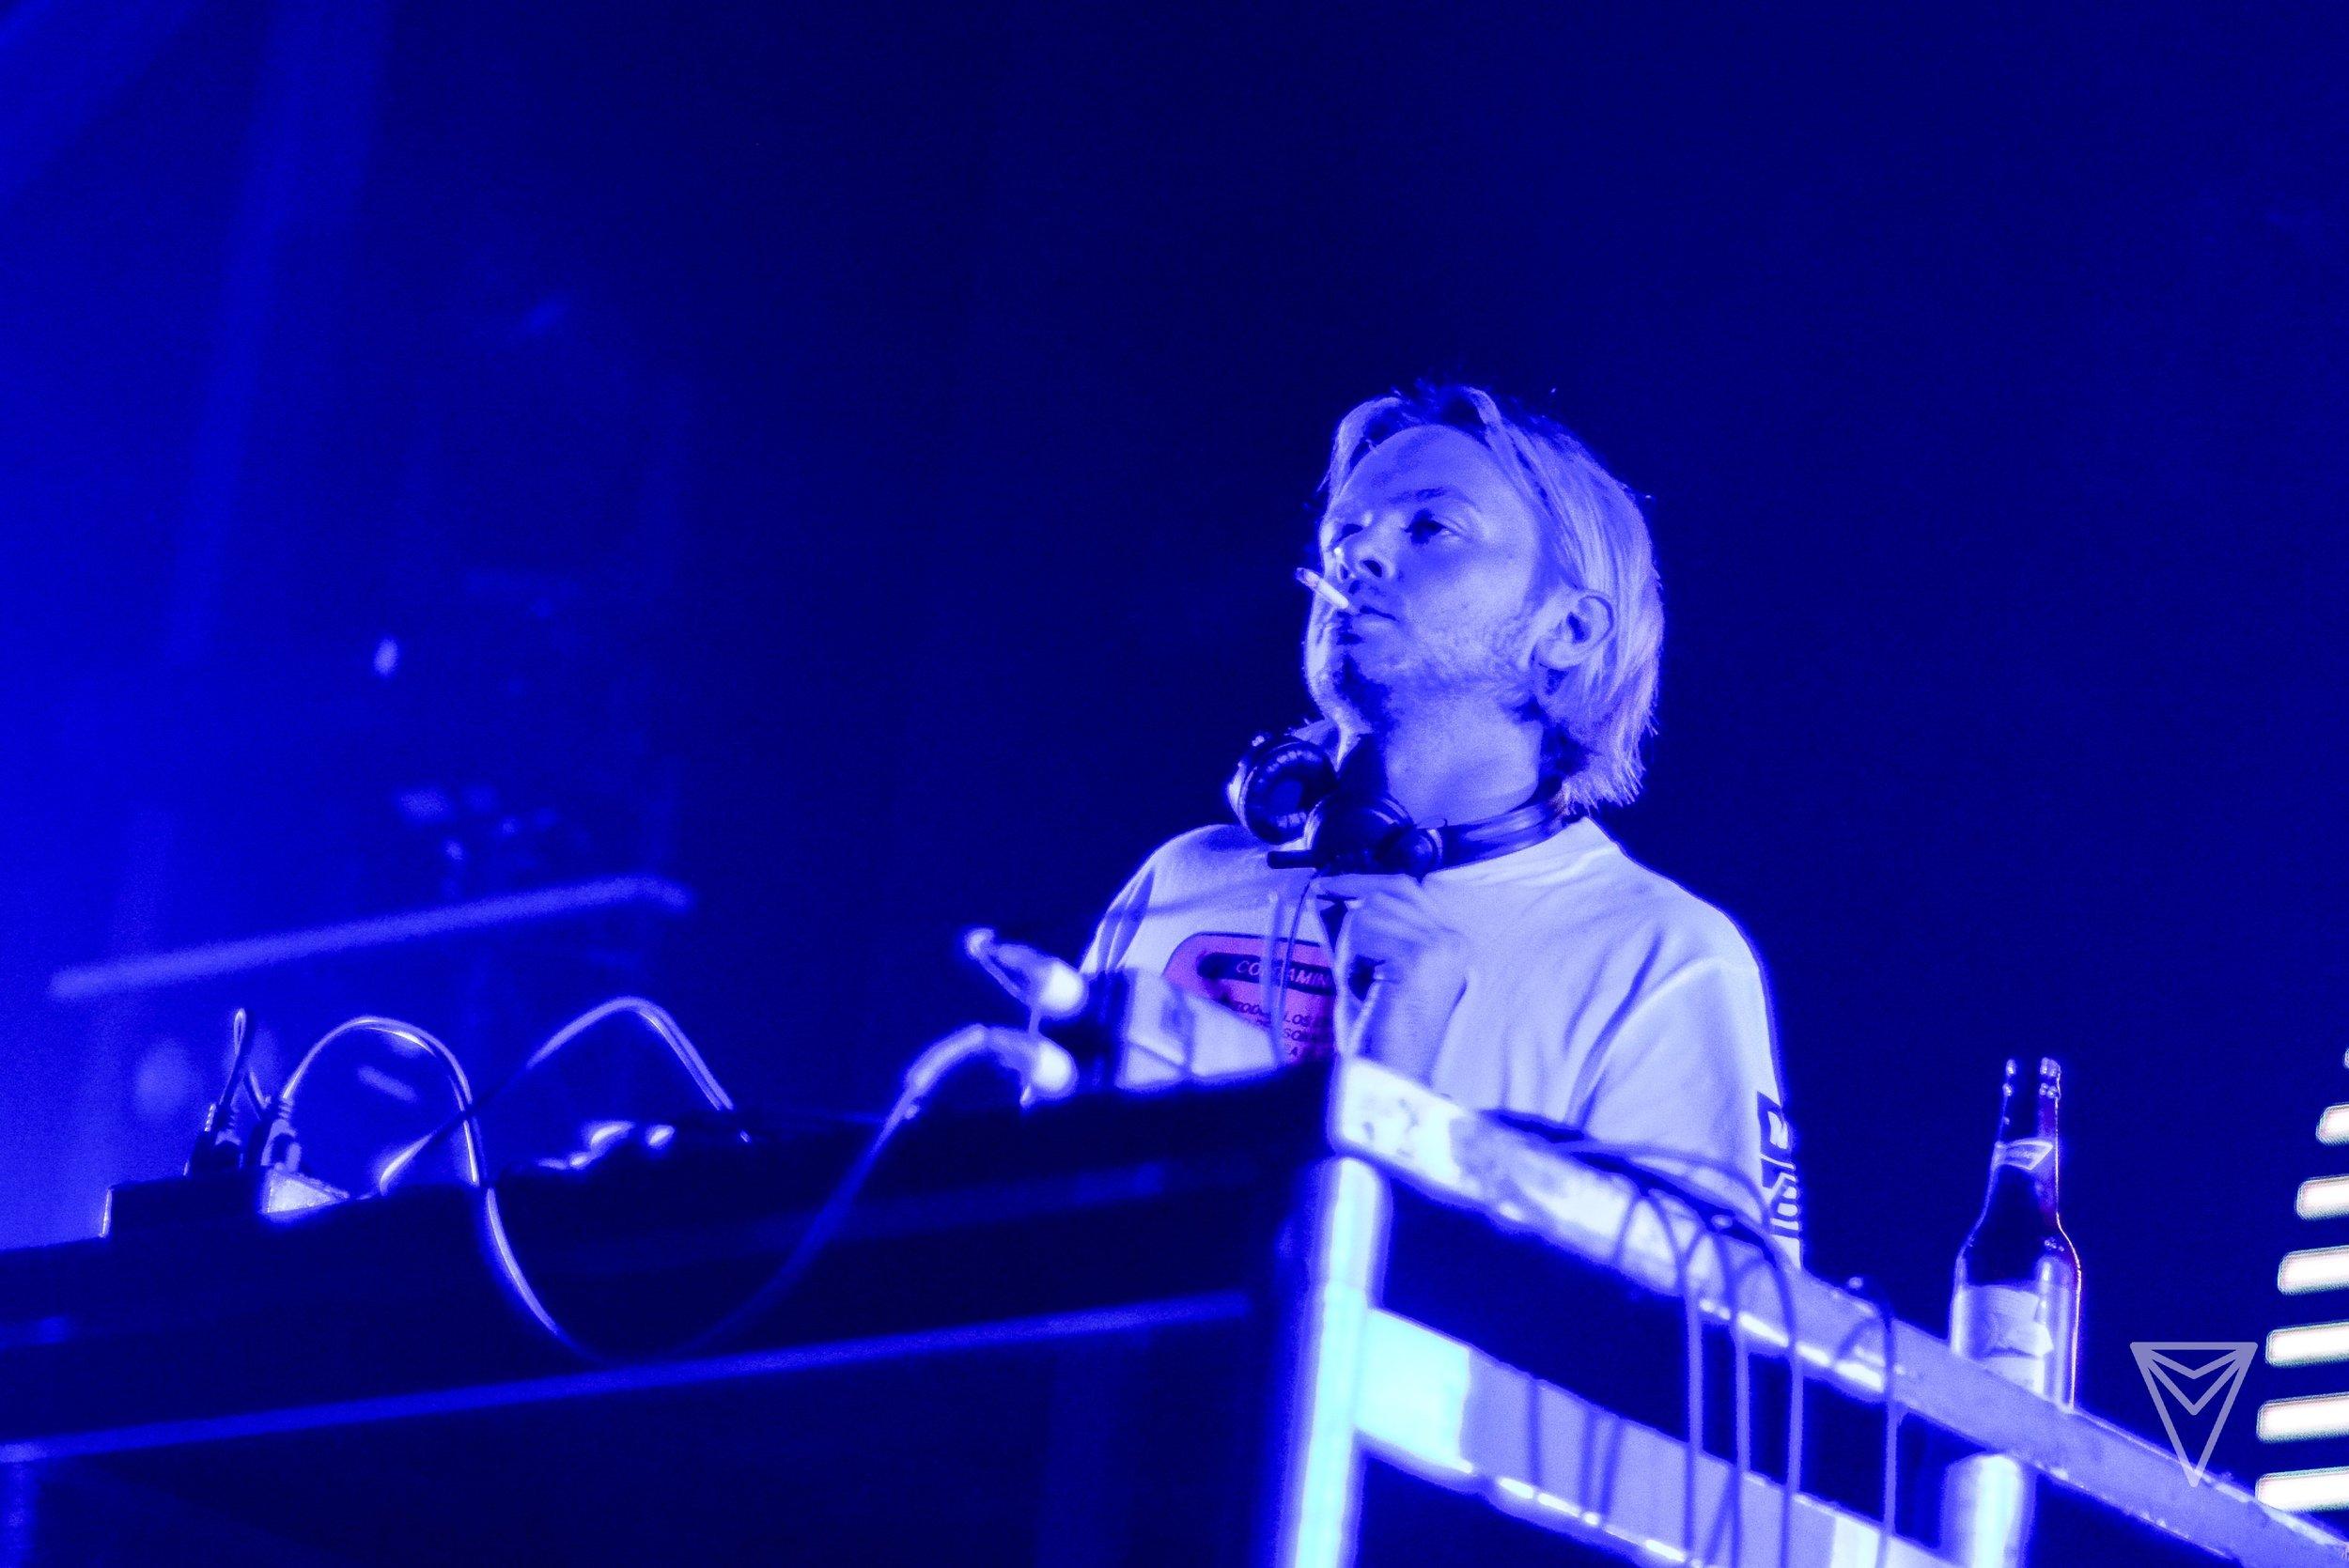 DJ SEINFIELD_SONARMEXICO (4).jpeg